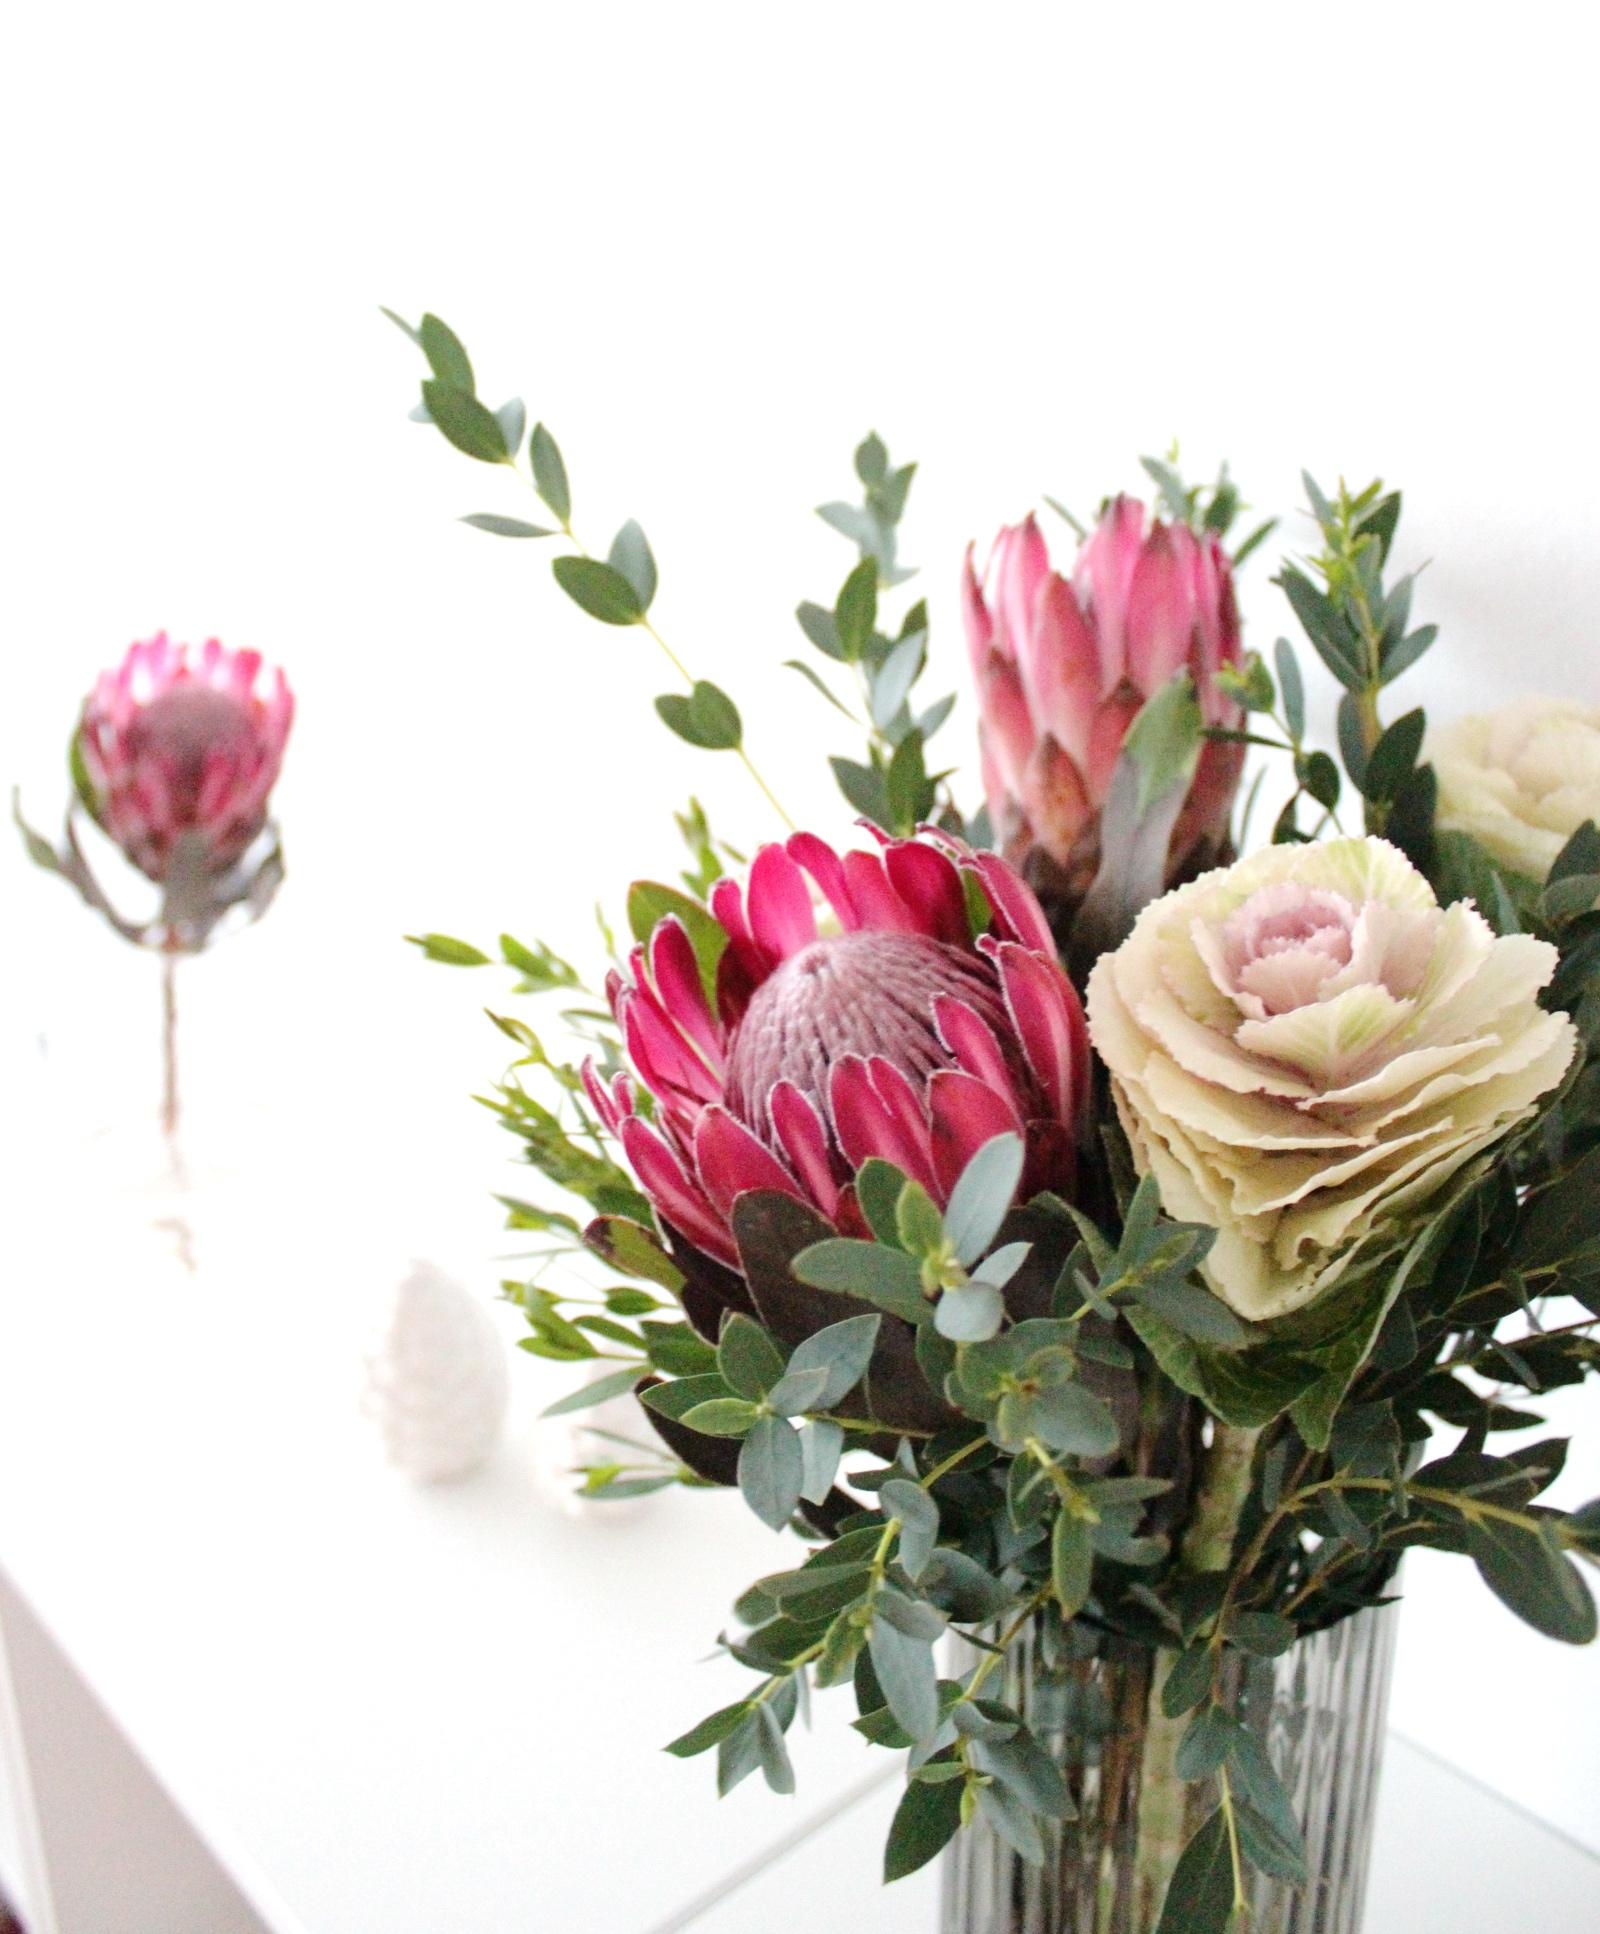 JUL vol.2 – Flowers